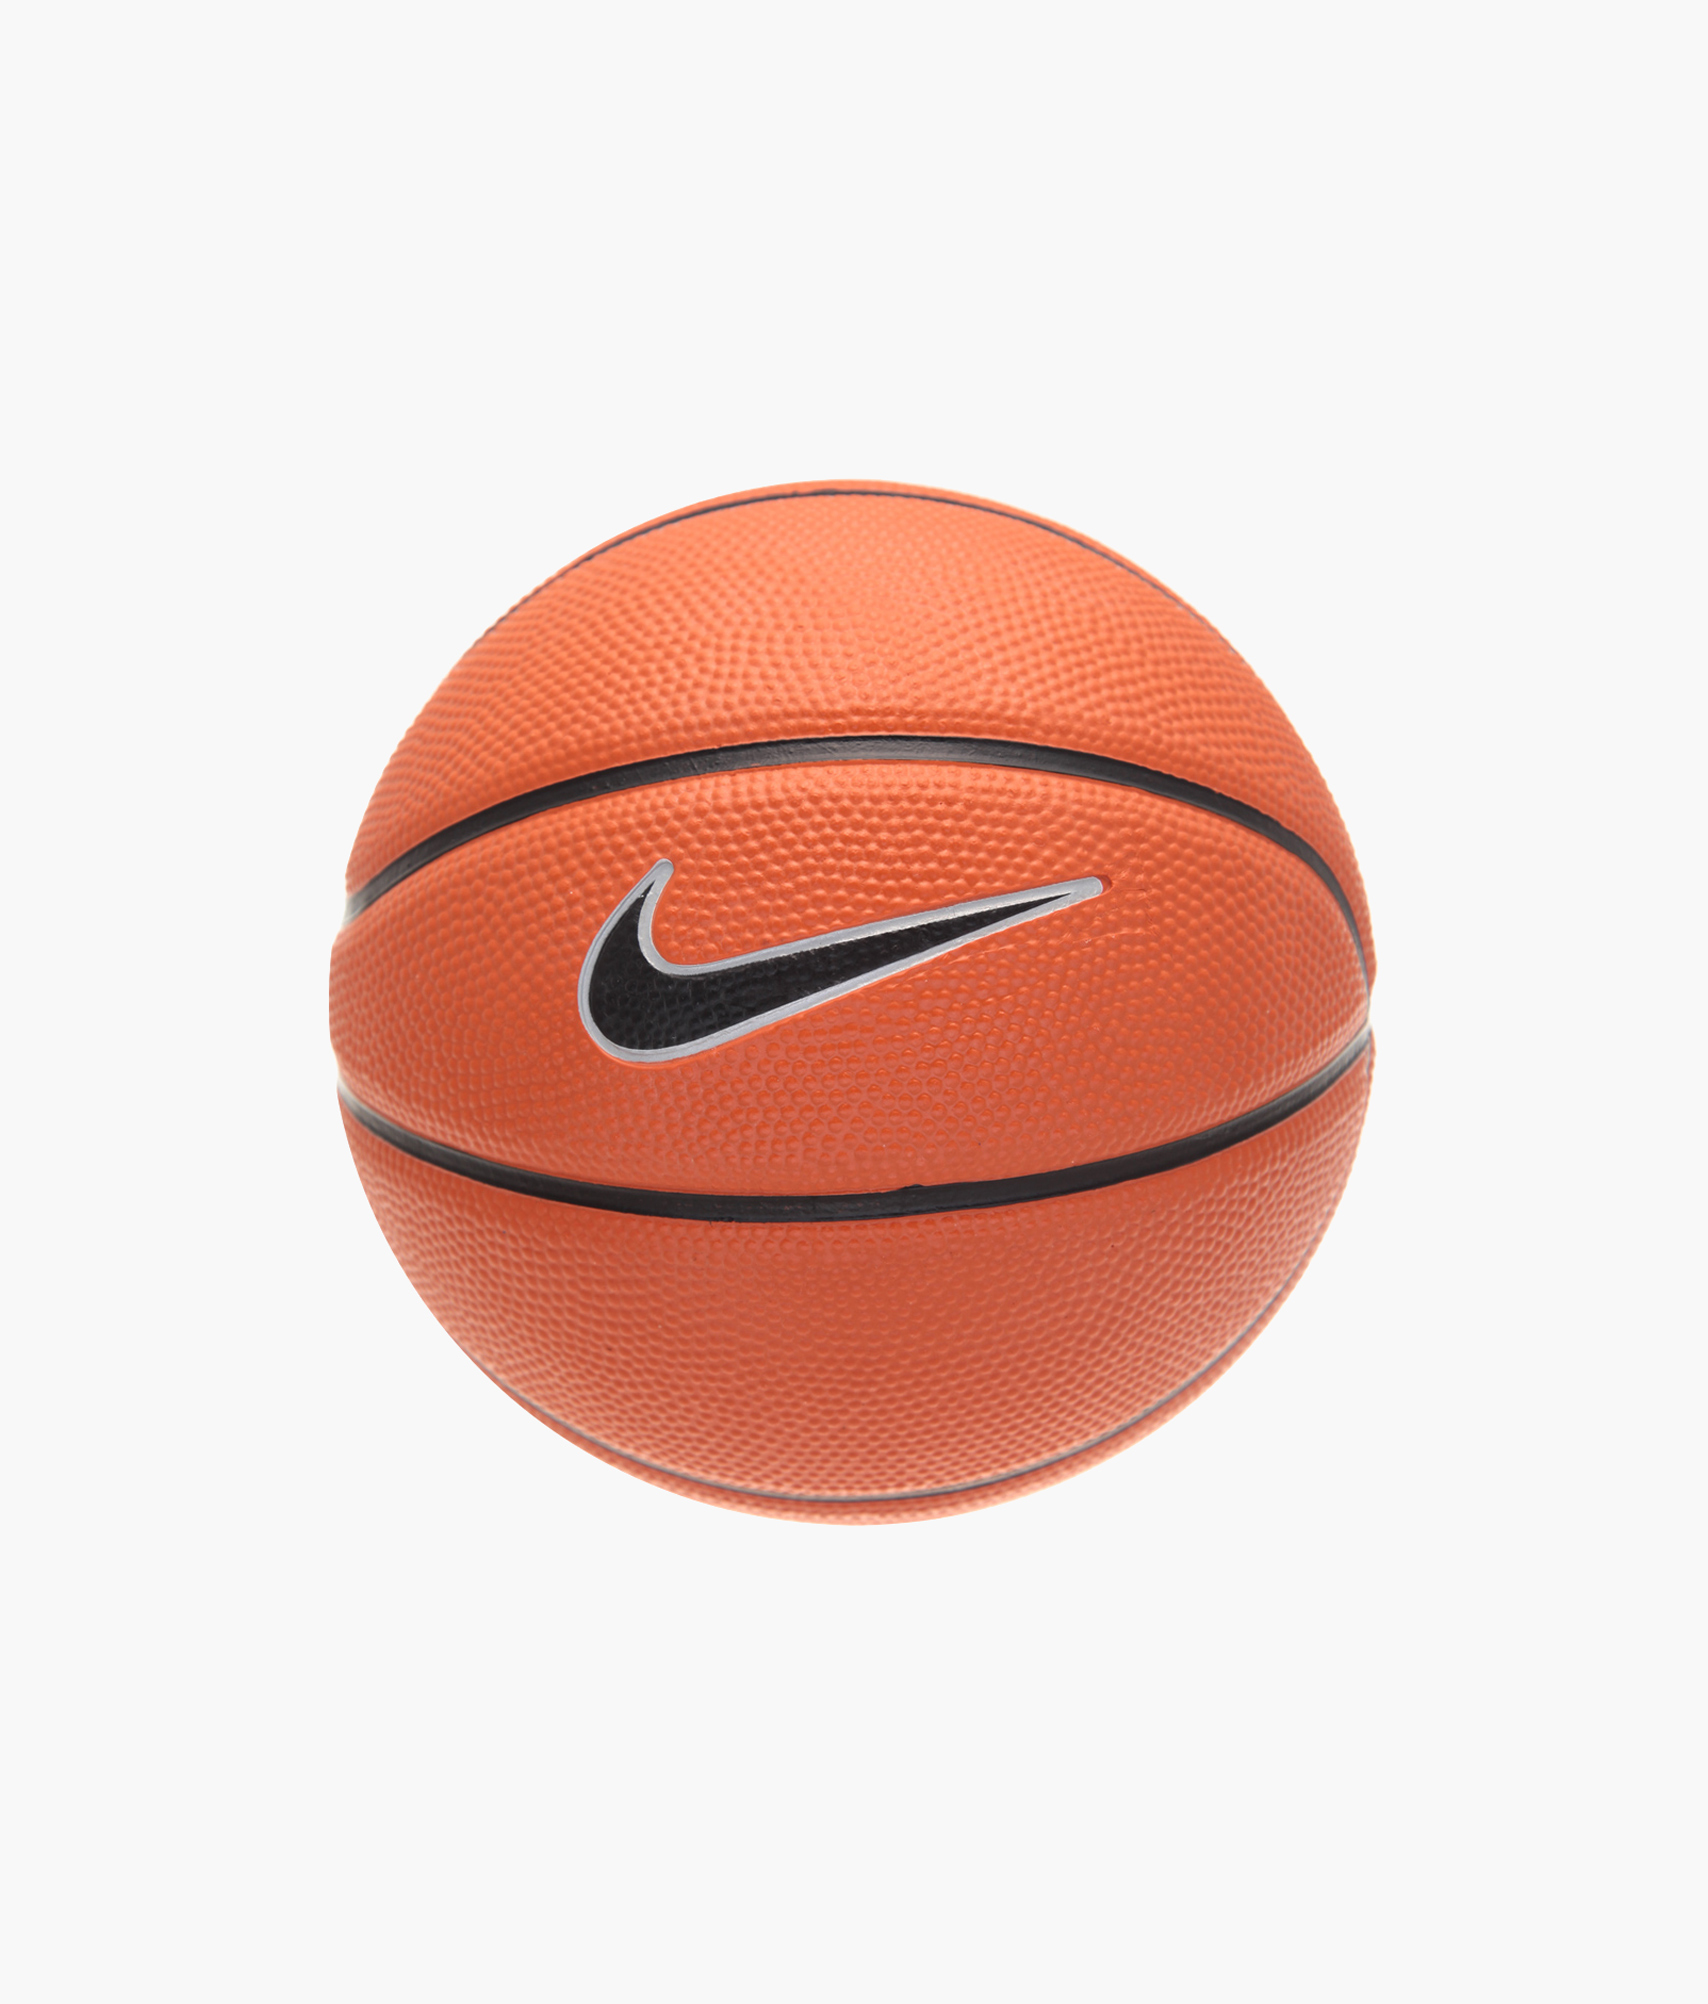 Мяч баскетбольный Nike Nike Цвет-Оранжевый топ фуфайка met girl топ фуфайка